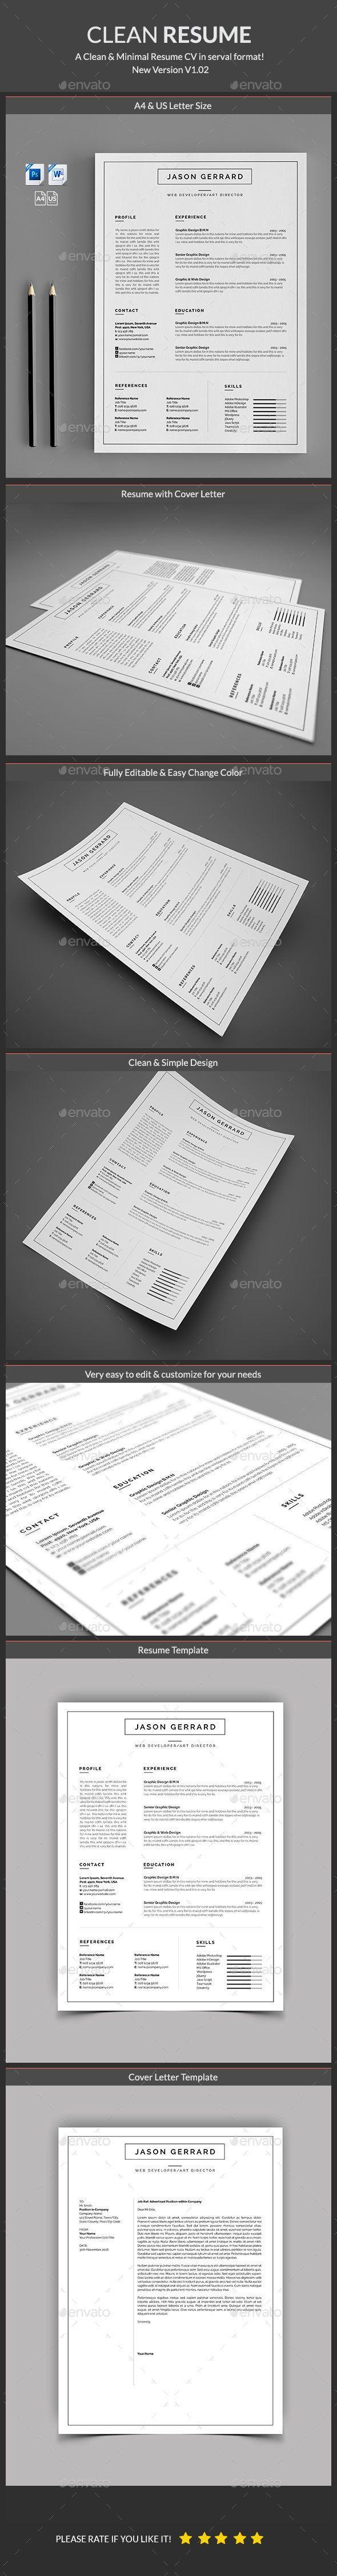 Best 25 Good resume examples ideas on